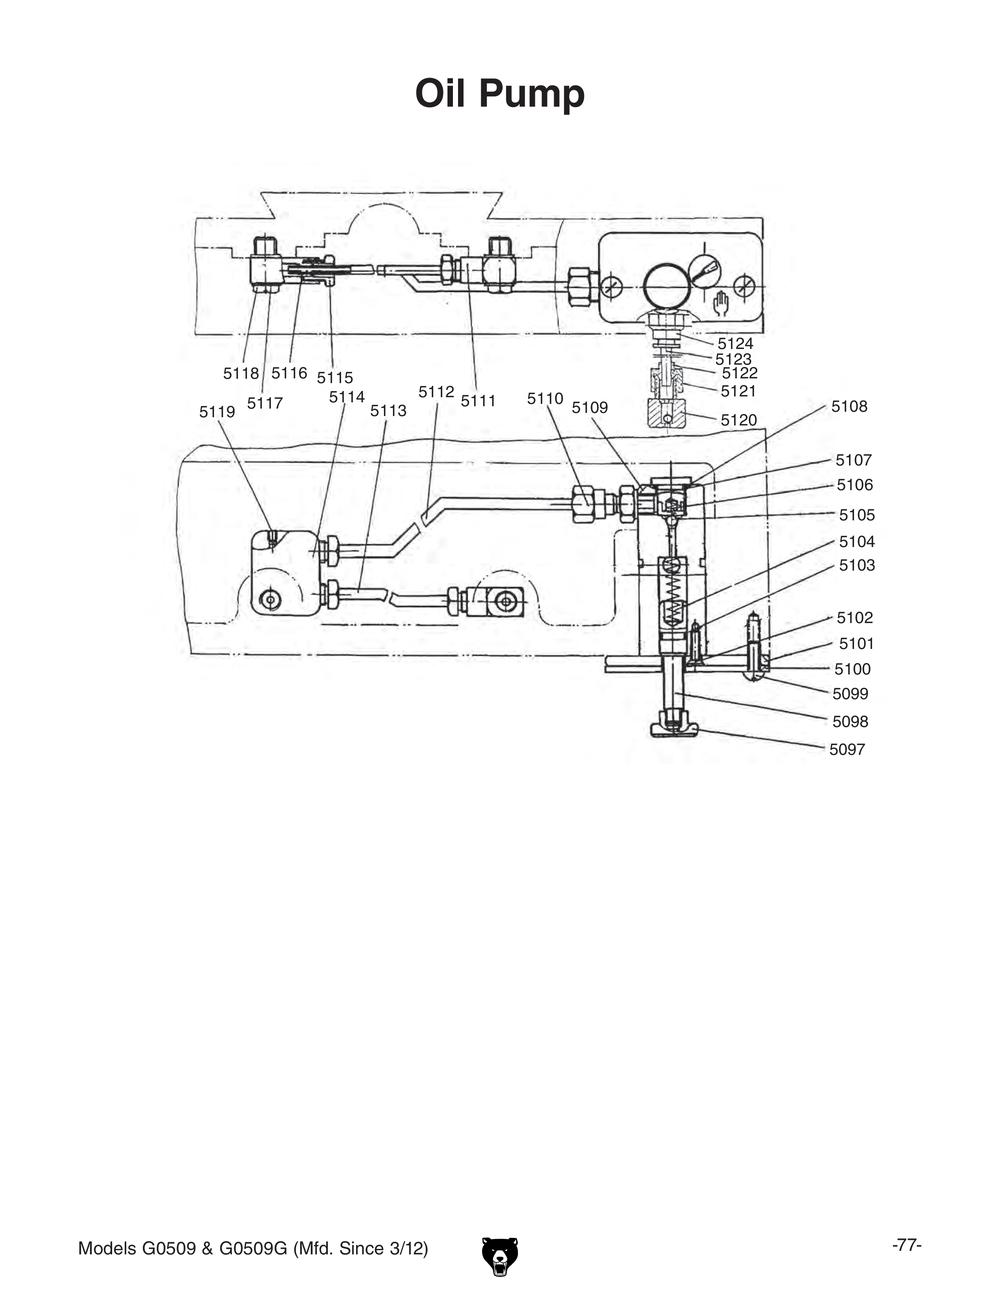 Sand Rail Alternator Wiring as well Denso External Voltage Regulator Wiring Diagram moreover Dune Buggy Ignition Switch Wiring Diagram together with Sand Rail Wiring Diagram furthermore Vw Dune Buggy Wiring Harness. on vw rail buggy wiring diagrams